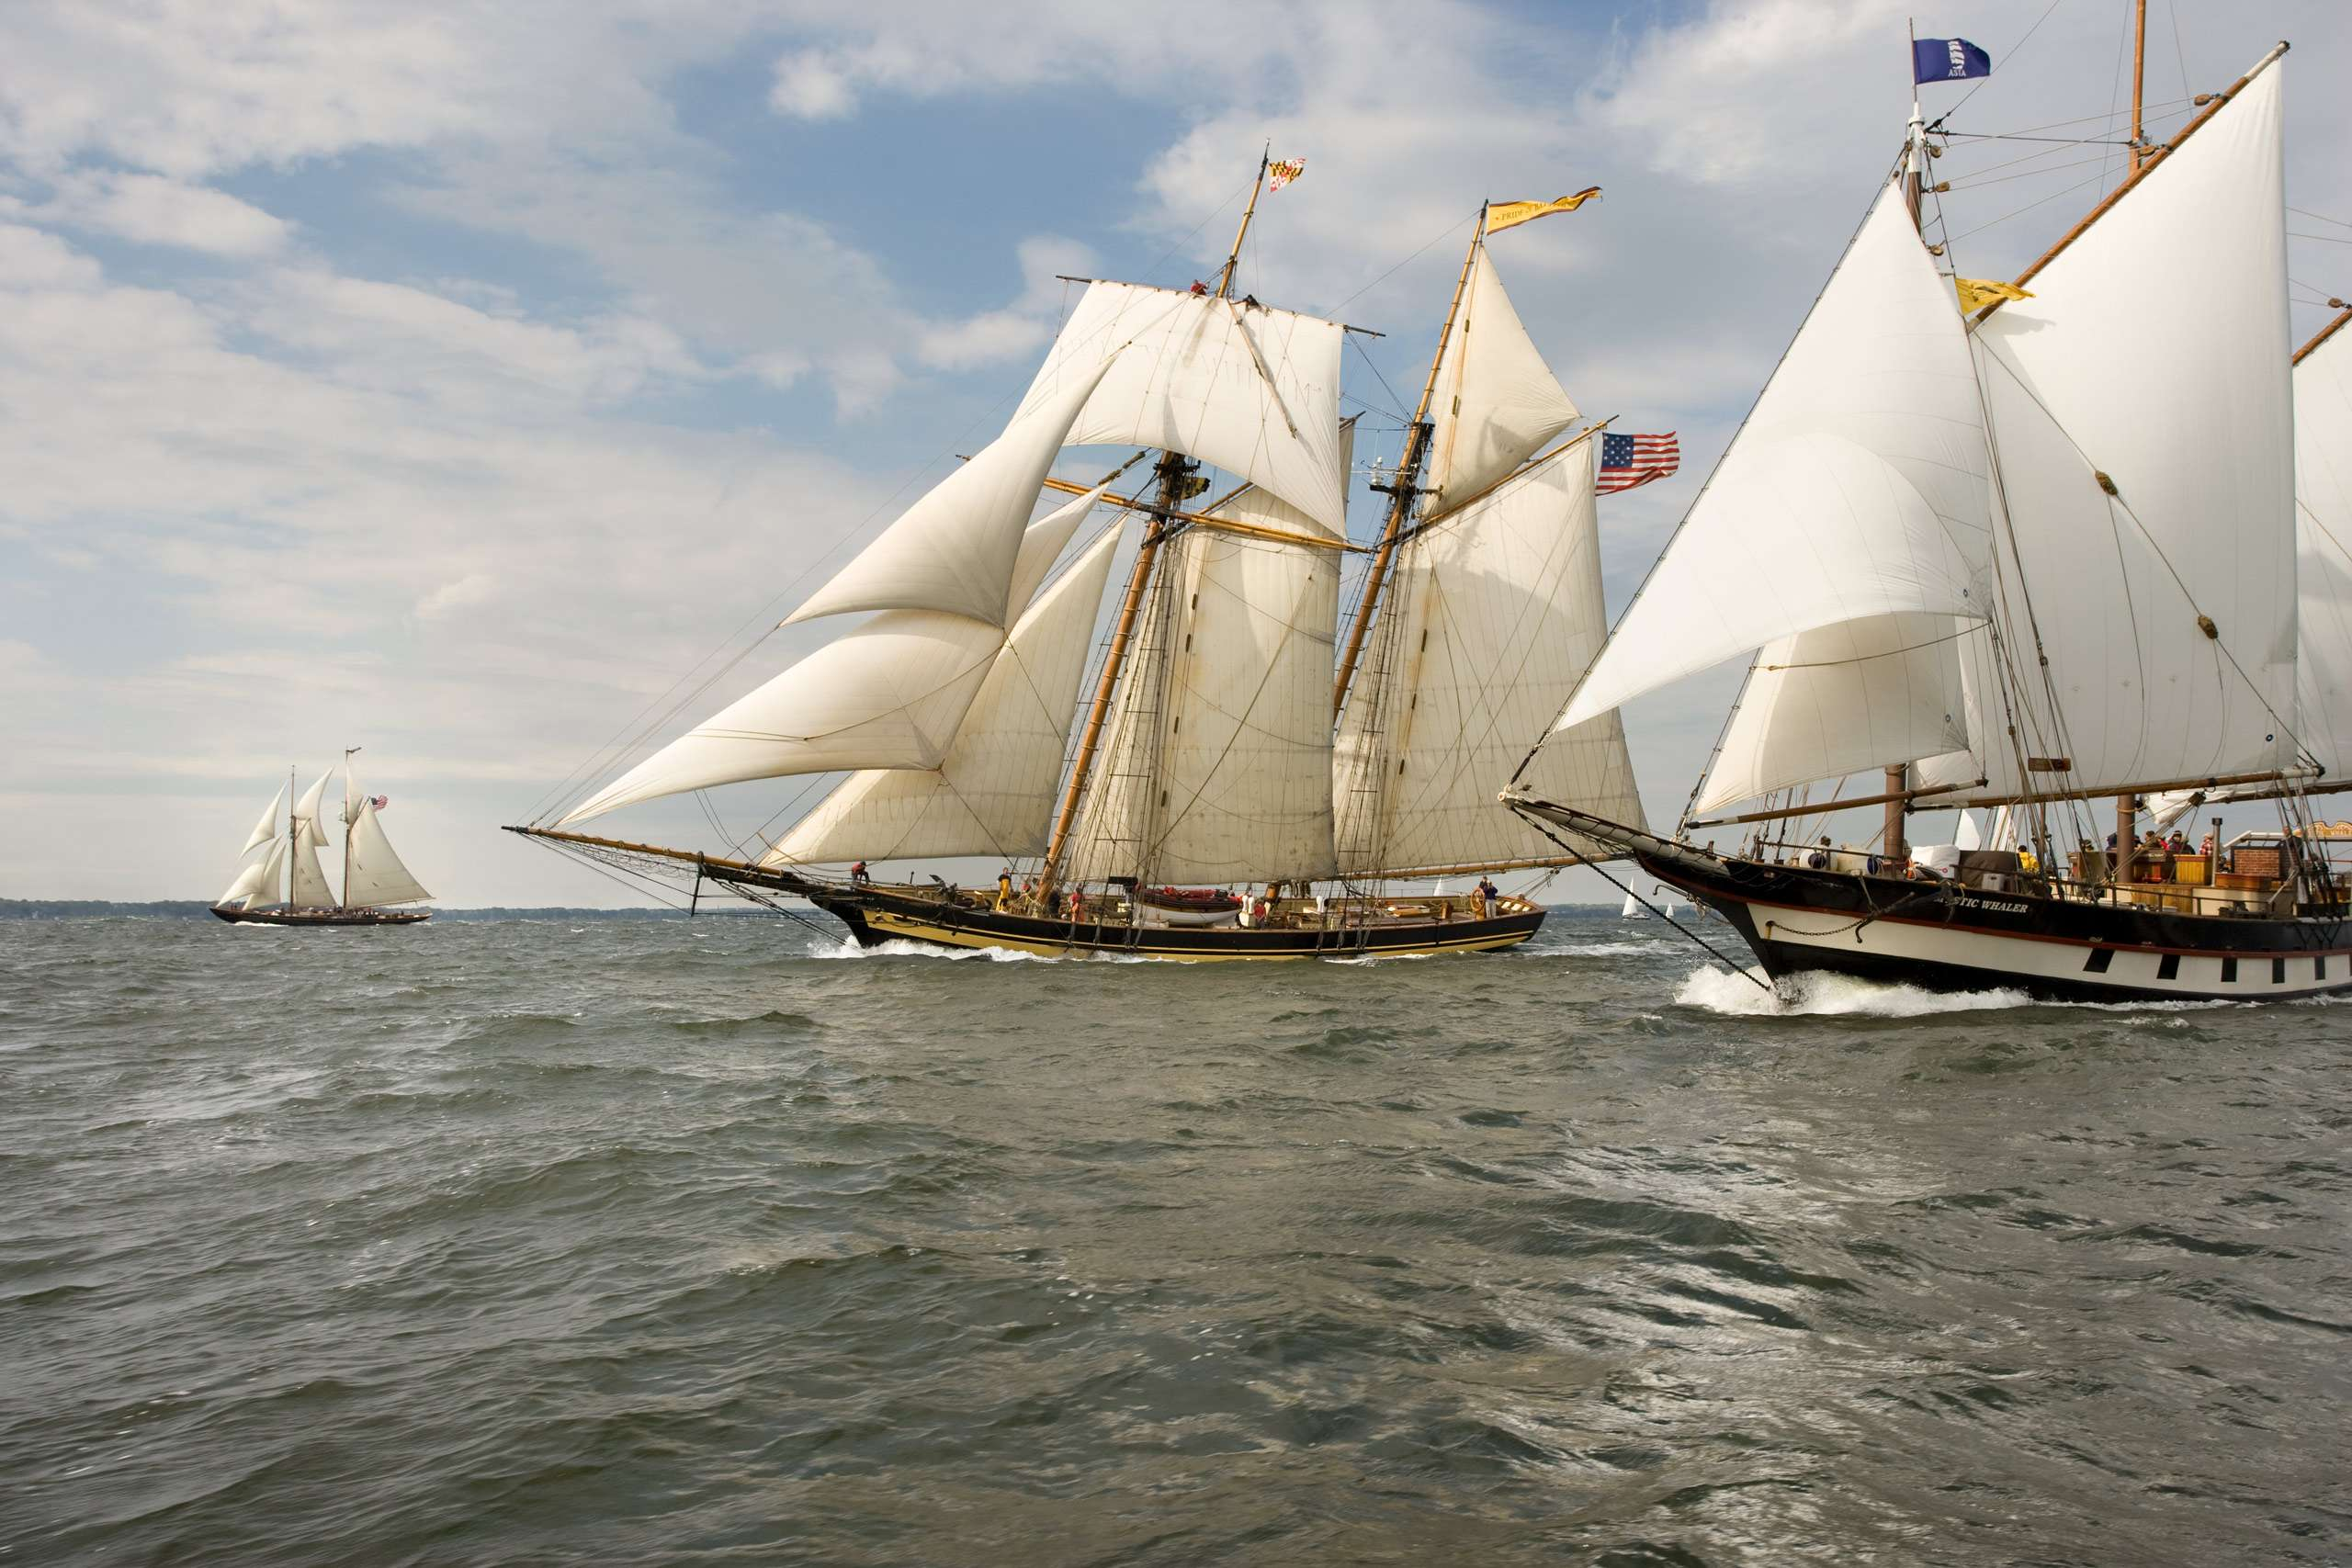 PORTFOLIO - Sailing - Tall Ships #9-PCG292